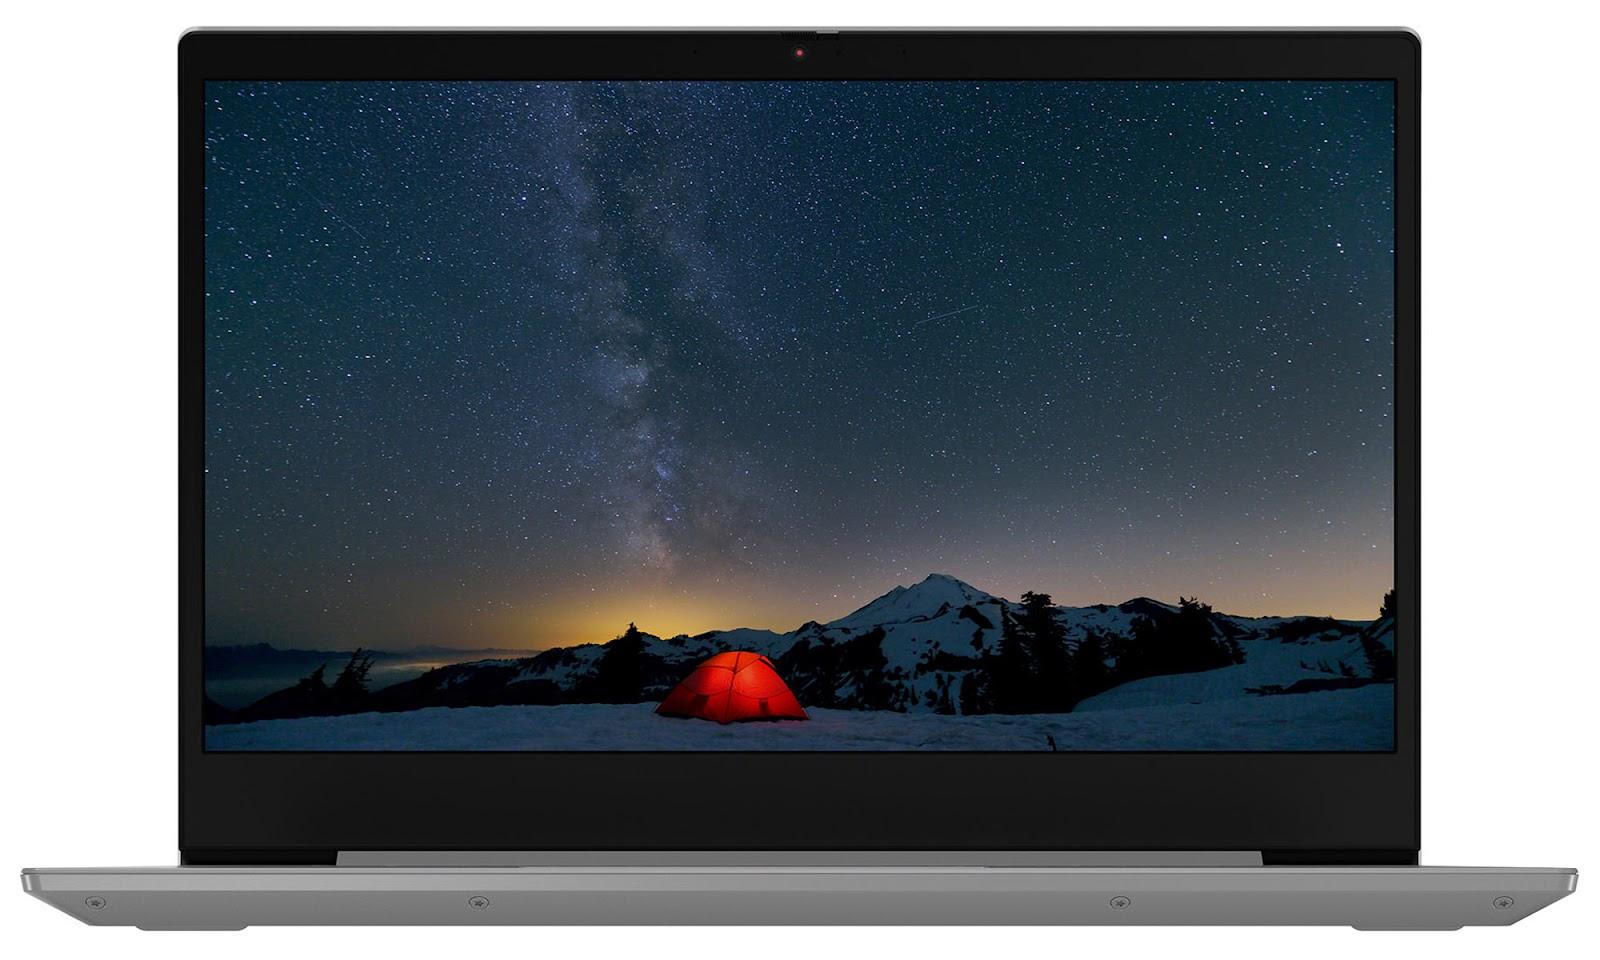 Фото 1. Ноутбук Lenovo ThinkBook 14 IIL (20SL00FARU)